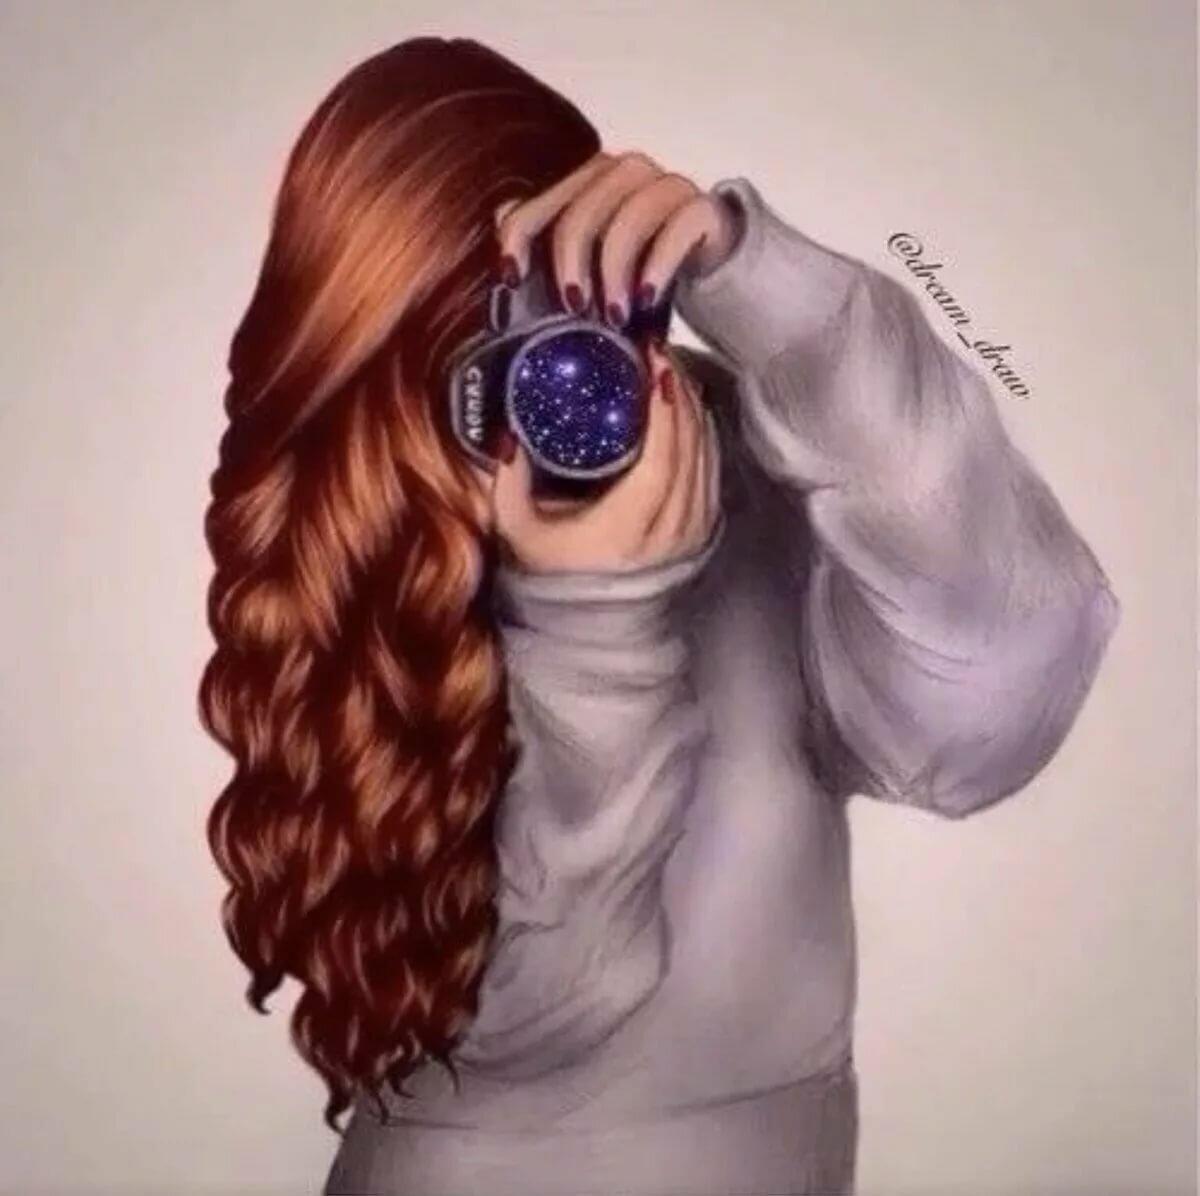 Картинки на аву в вк девушки с телефоном